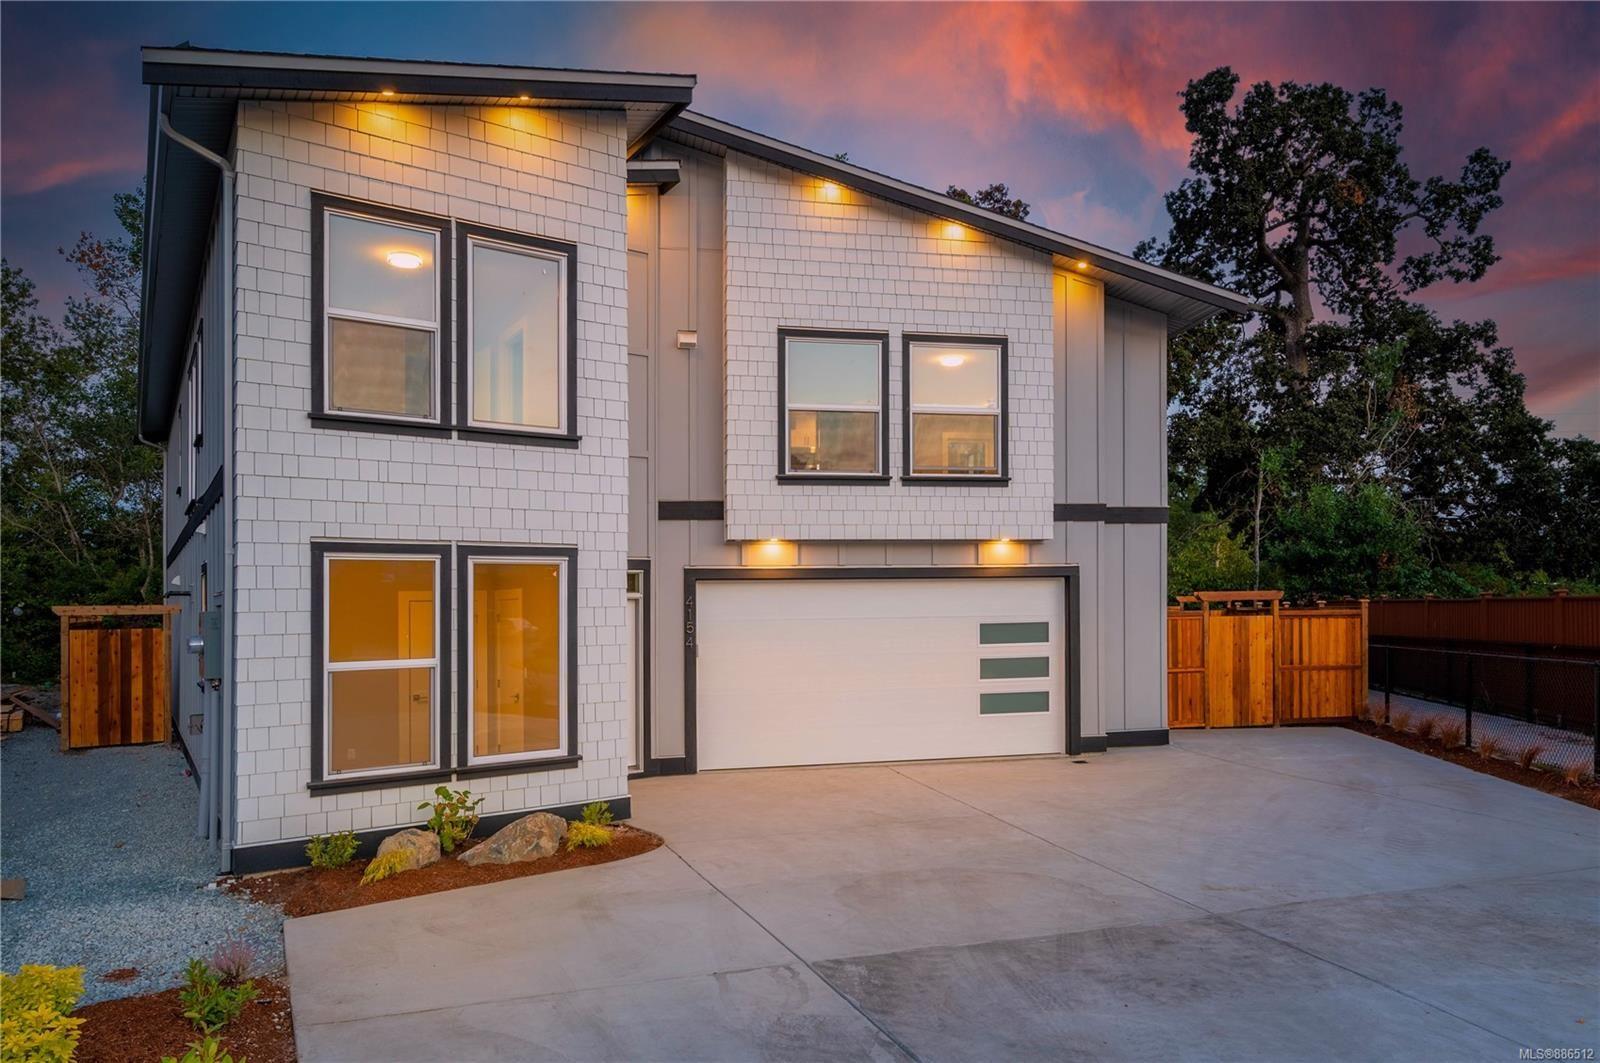 Main Photo: 4154 Jagat Pl in Saanich: SE Lake Hill House for sale (Saanich East)  : MLS®# 886512